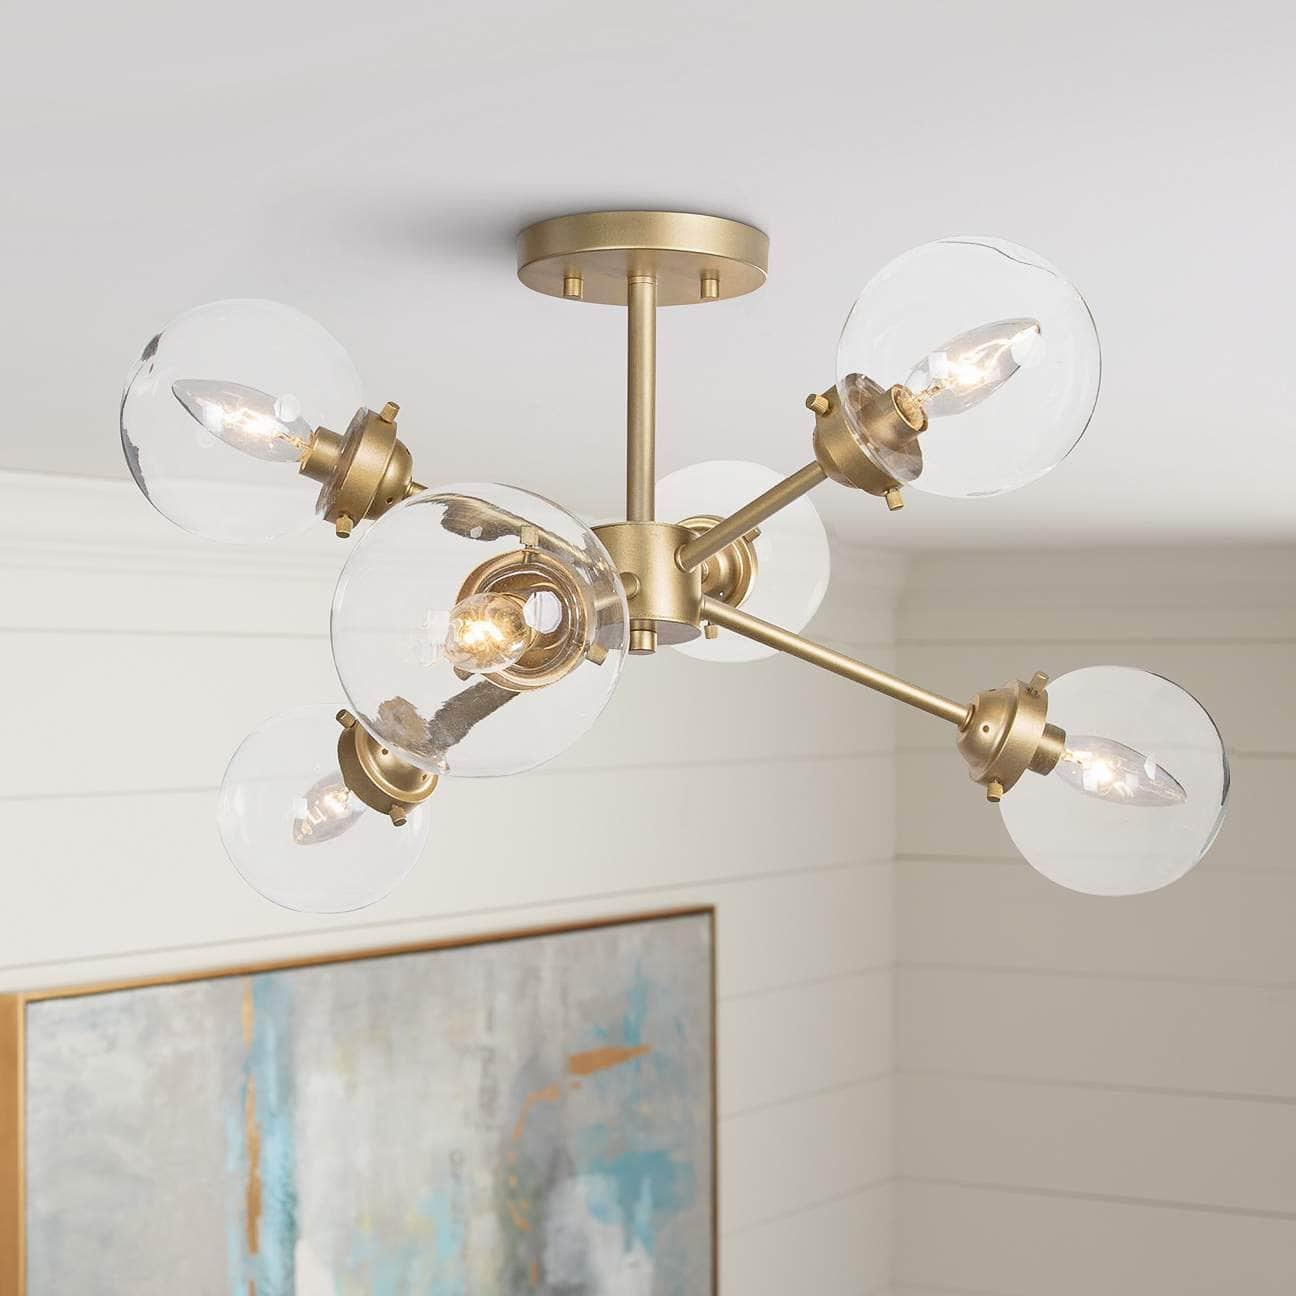 A Glam Sputnik Ceiling Light